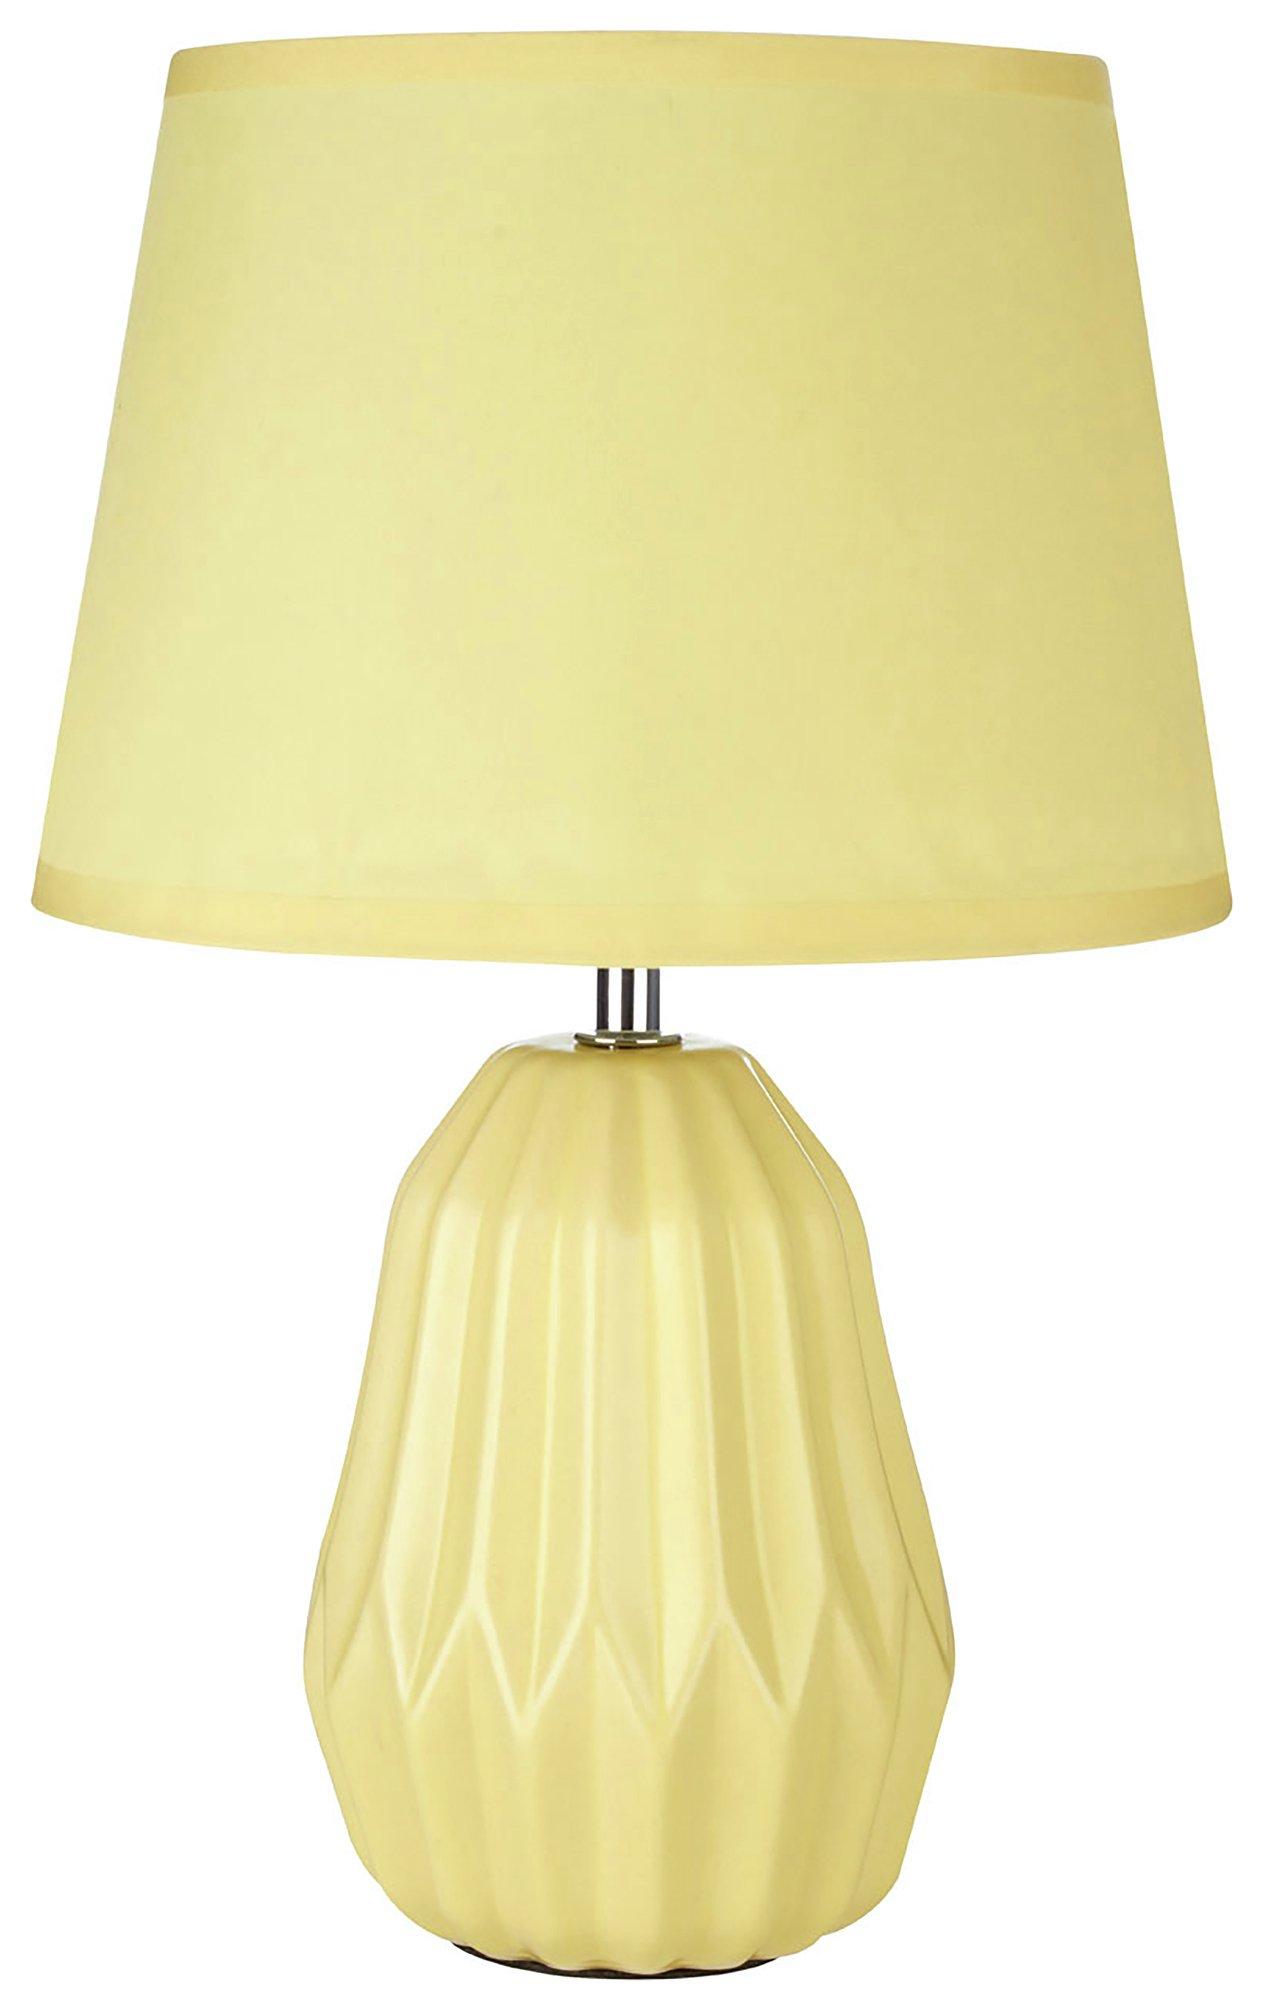 Image of Winslet - Ceramic - Table Lamp - Lemon